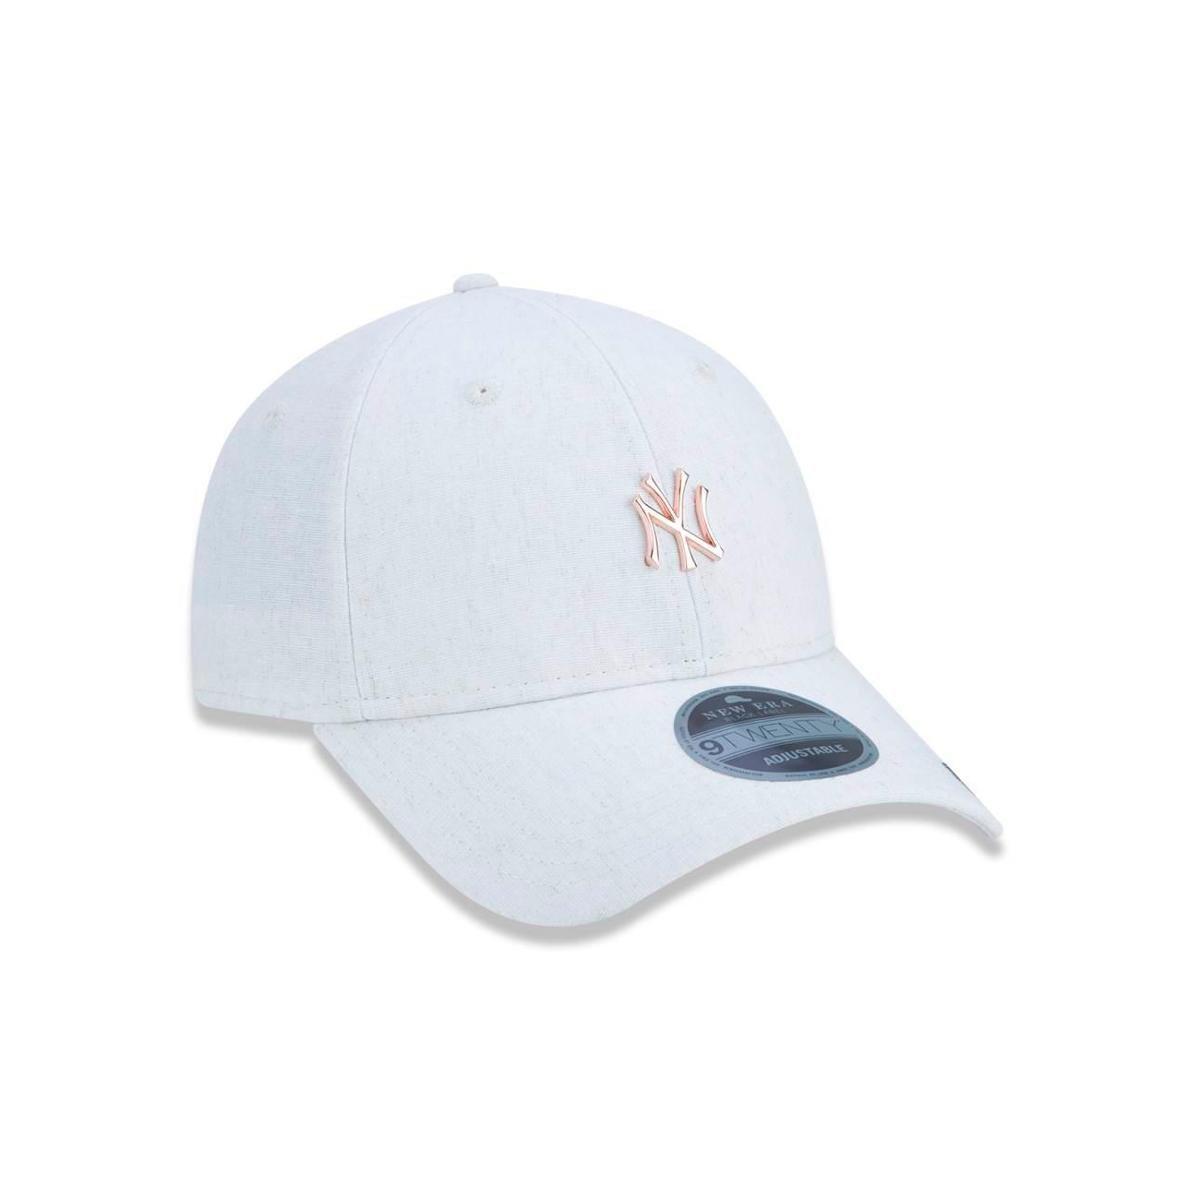 Boné 920 New York Yankees MLB Aba Curva New Era - Compre Agora ... b6ecff75ca523